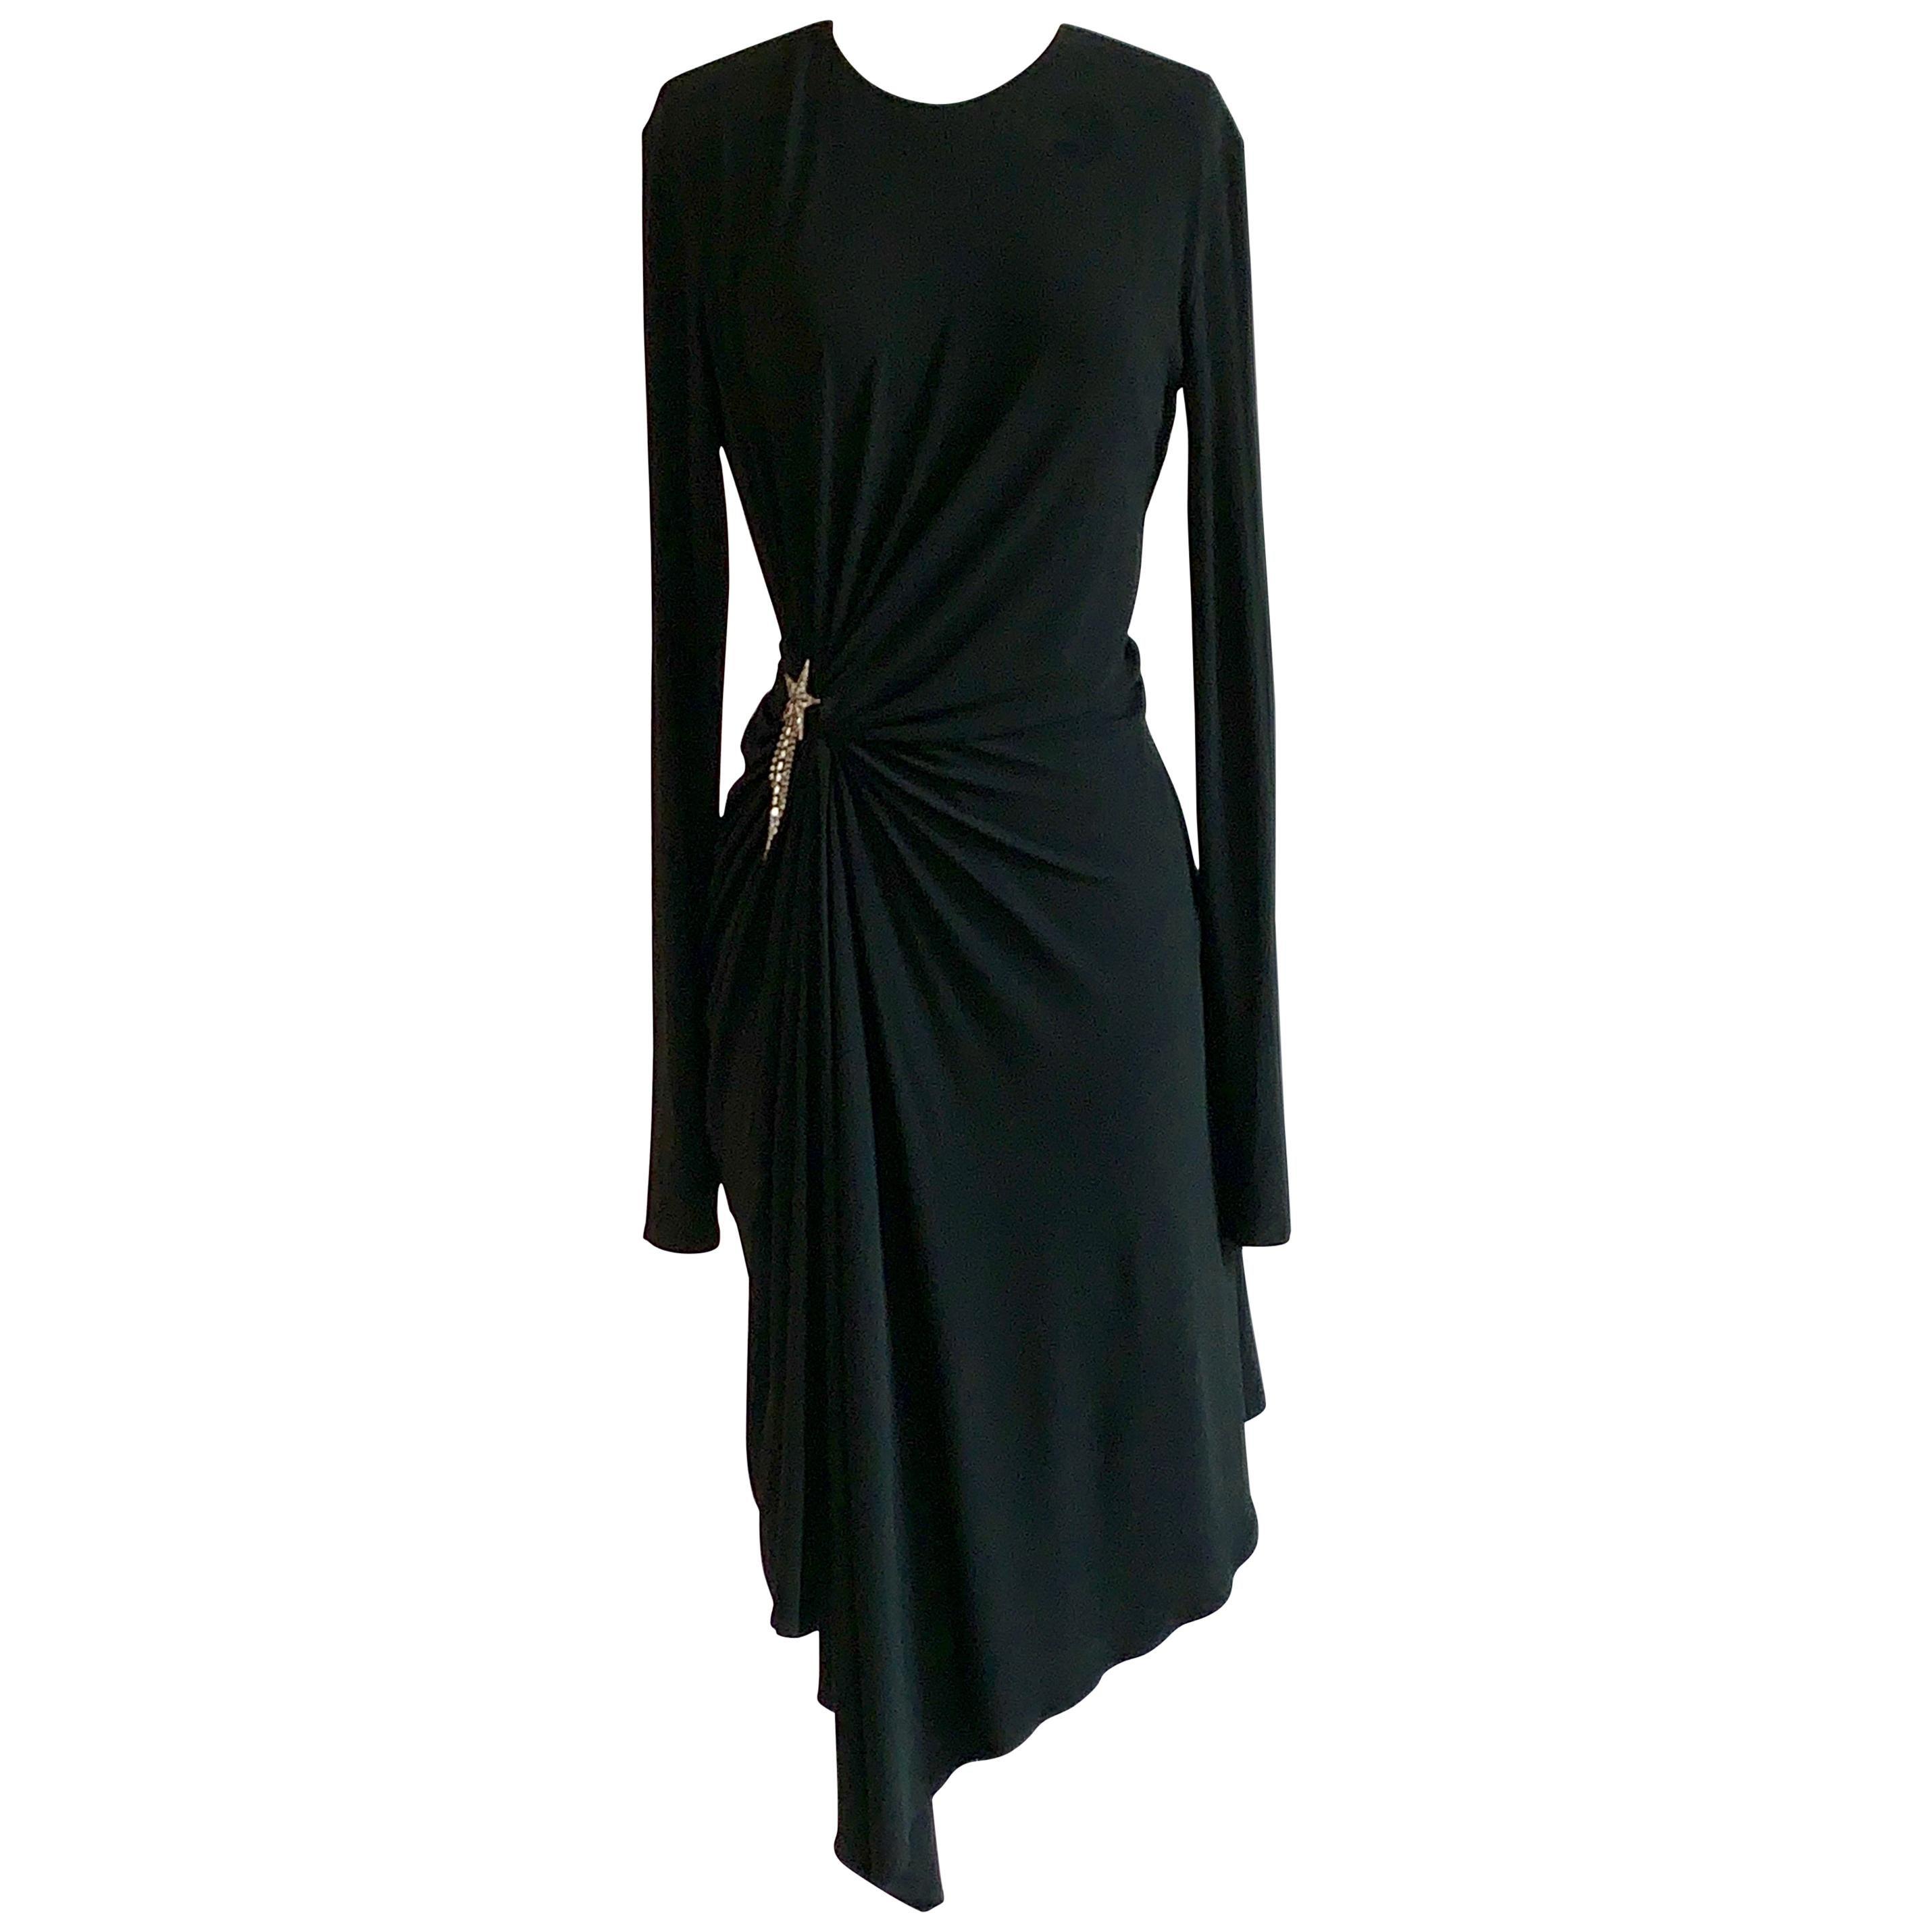 0b1921d4bea Vintage Yves Saint Laurent Day Dresses - 225 For Sale at 1stdibs